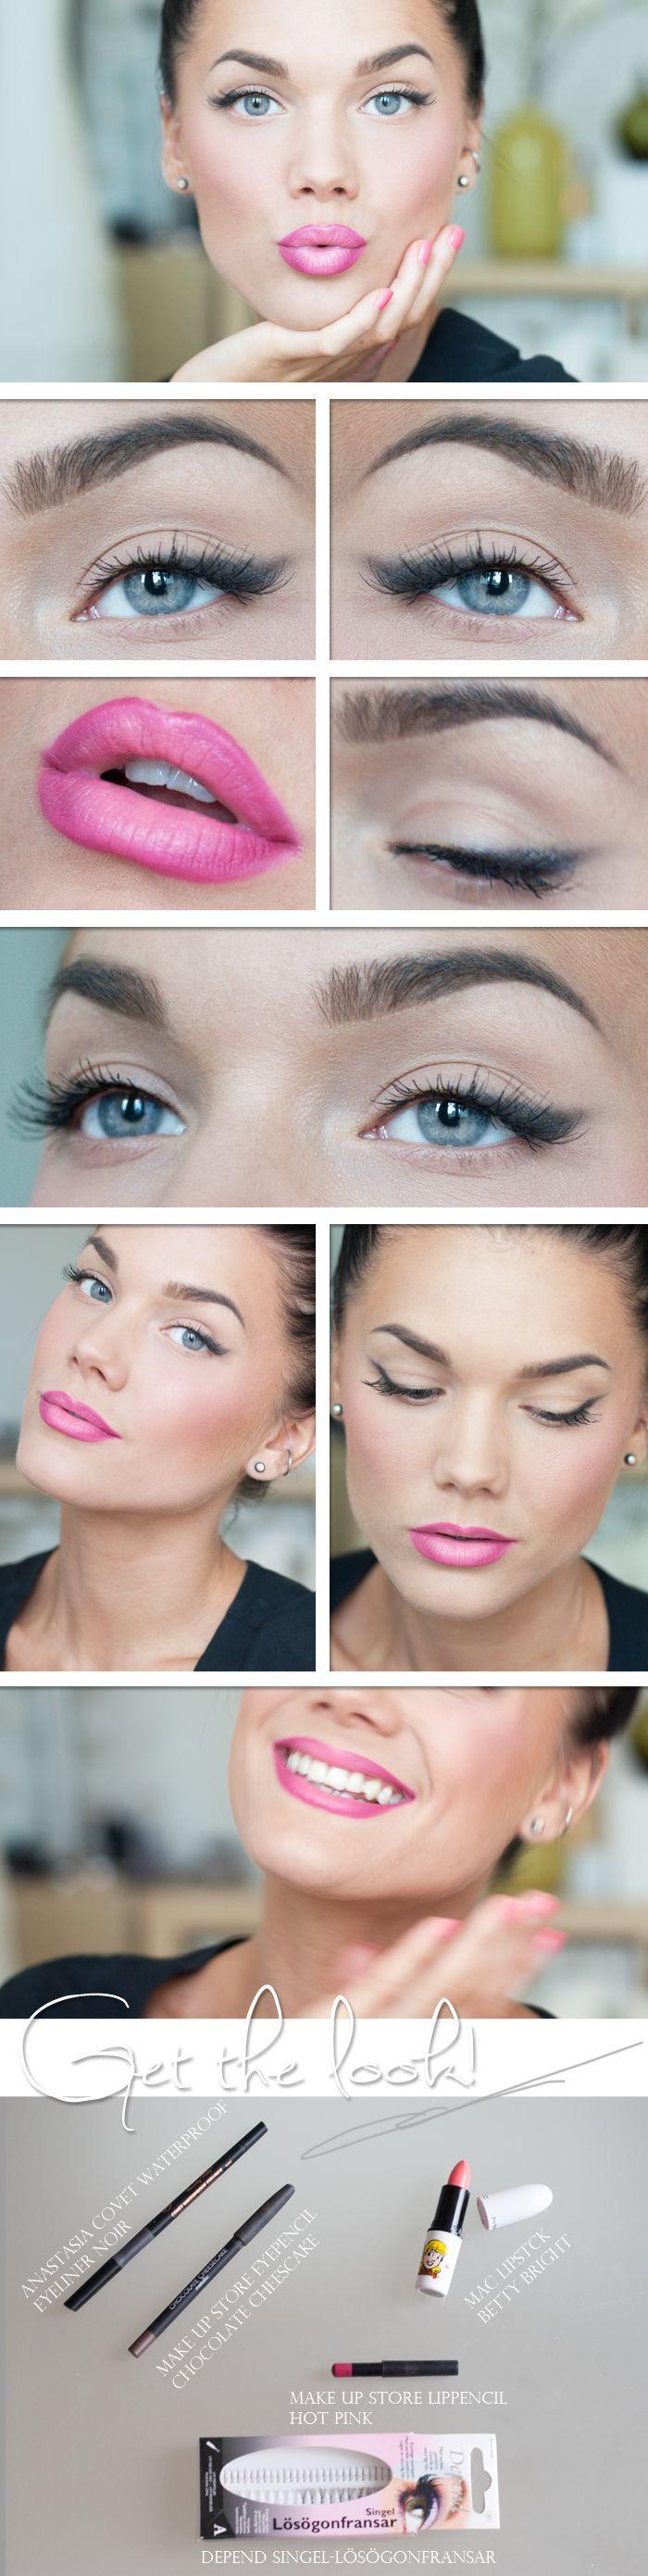 cute make up look